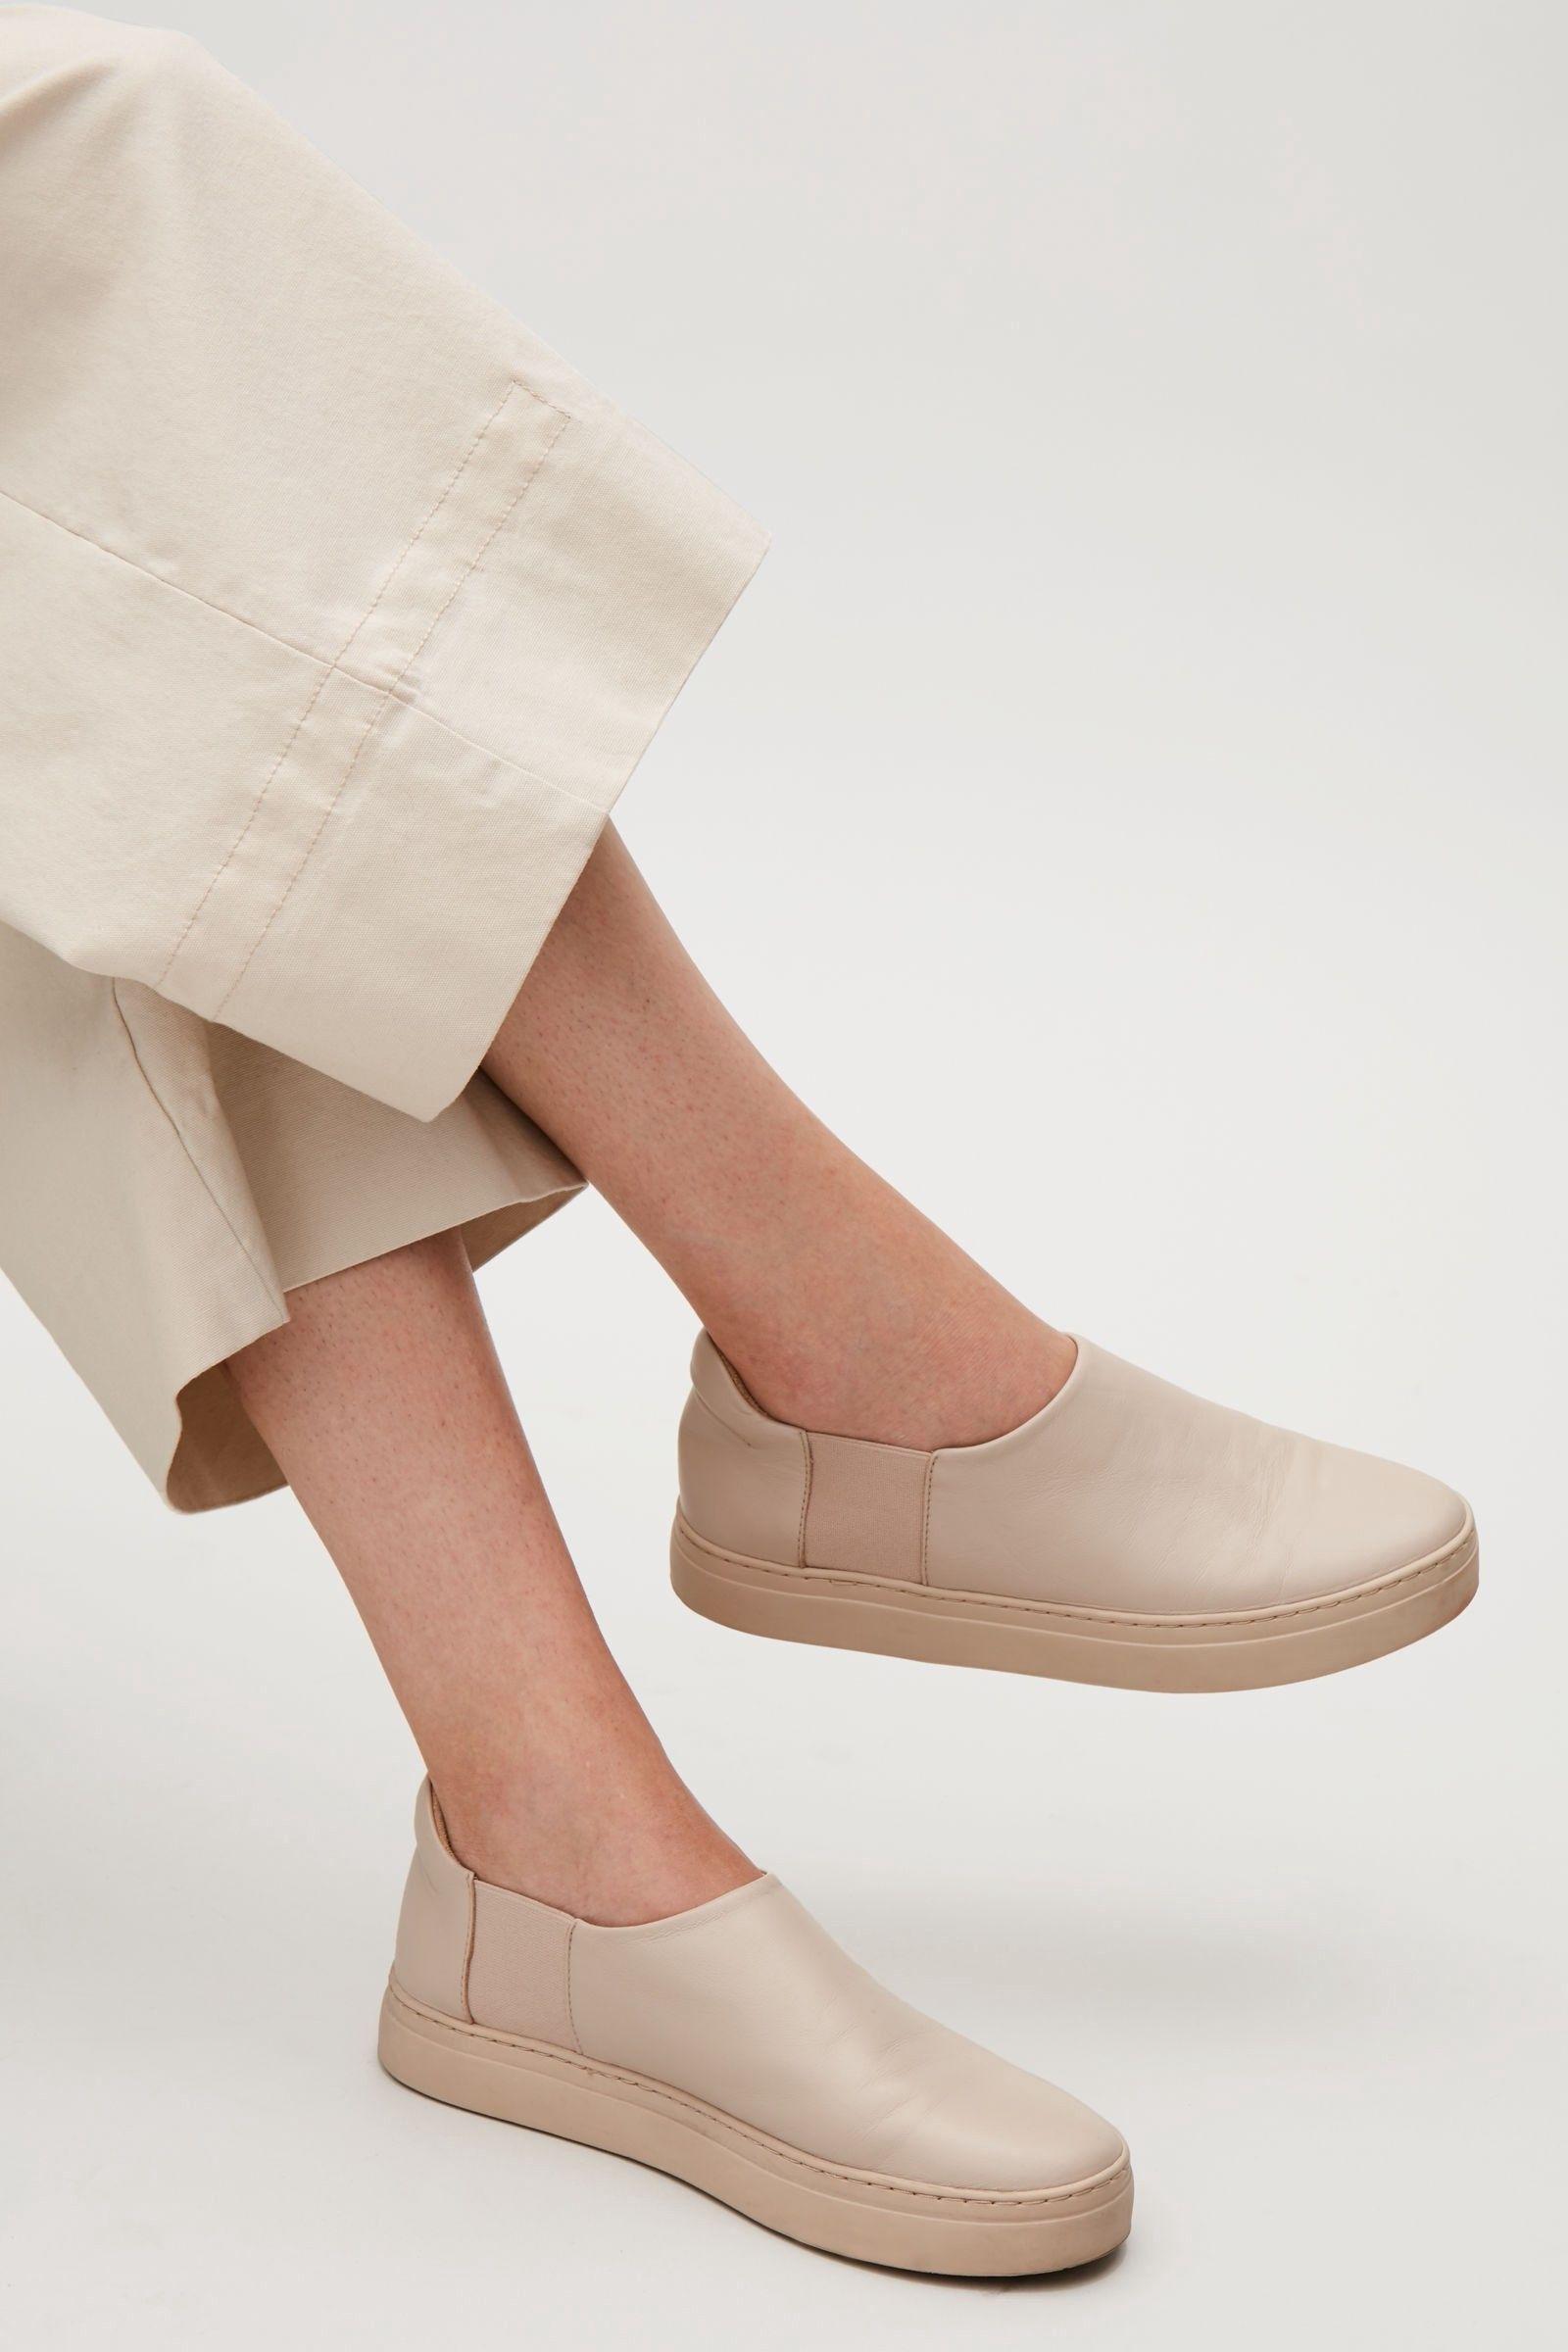 super popular 1f95b b0c86 Cos Slip-On Leather Sneakers - Sand 9.5 Adidas Nmd Xr1 Pk, Vans Sneakers